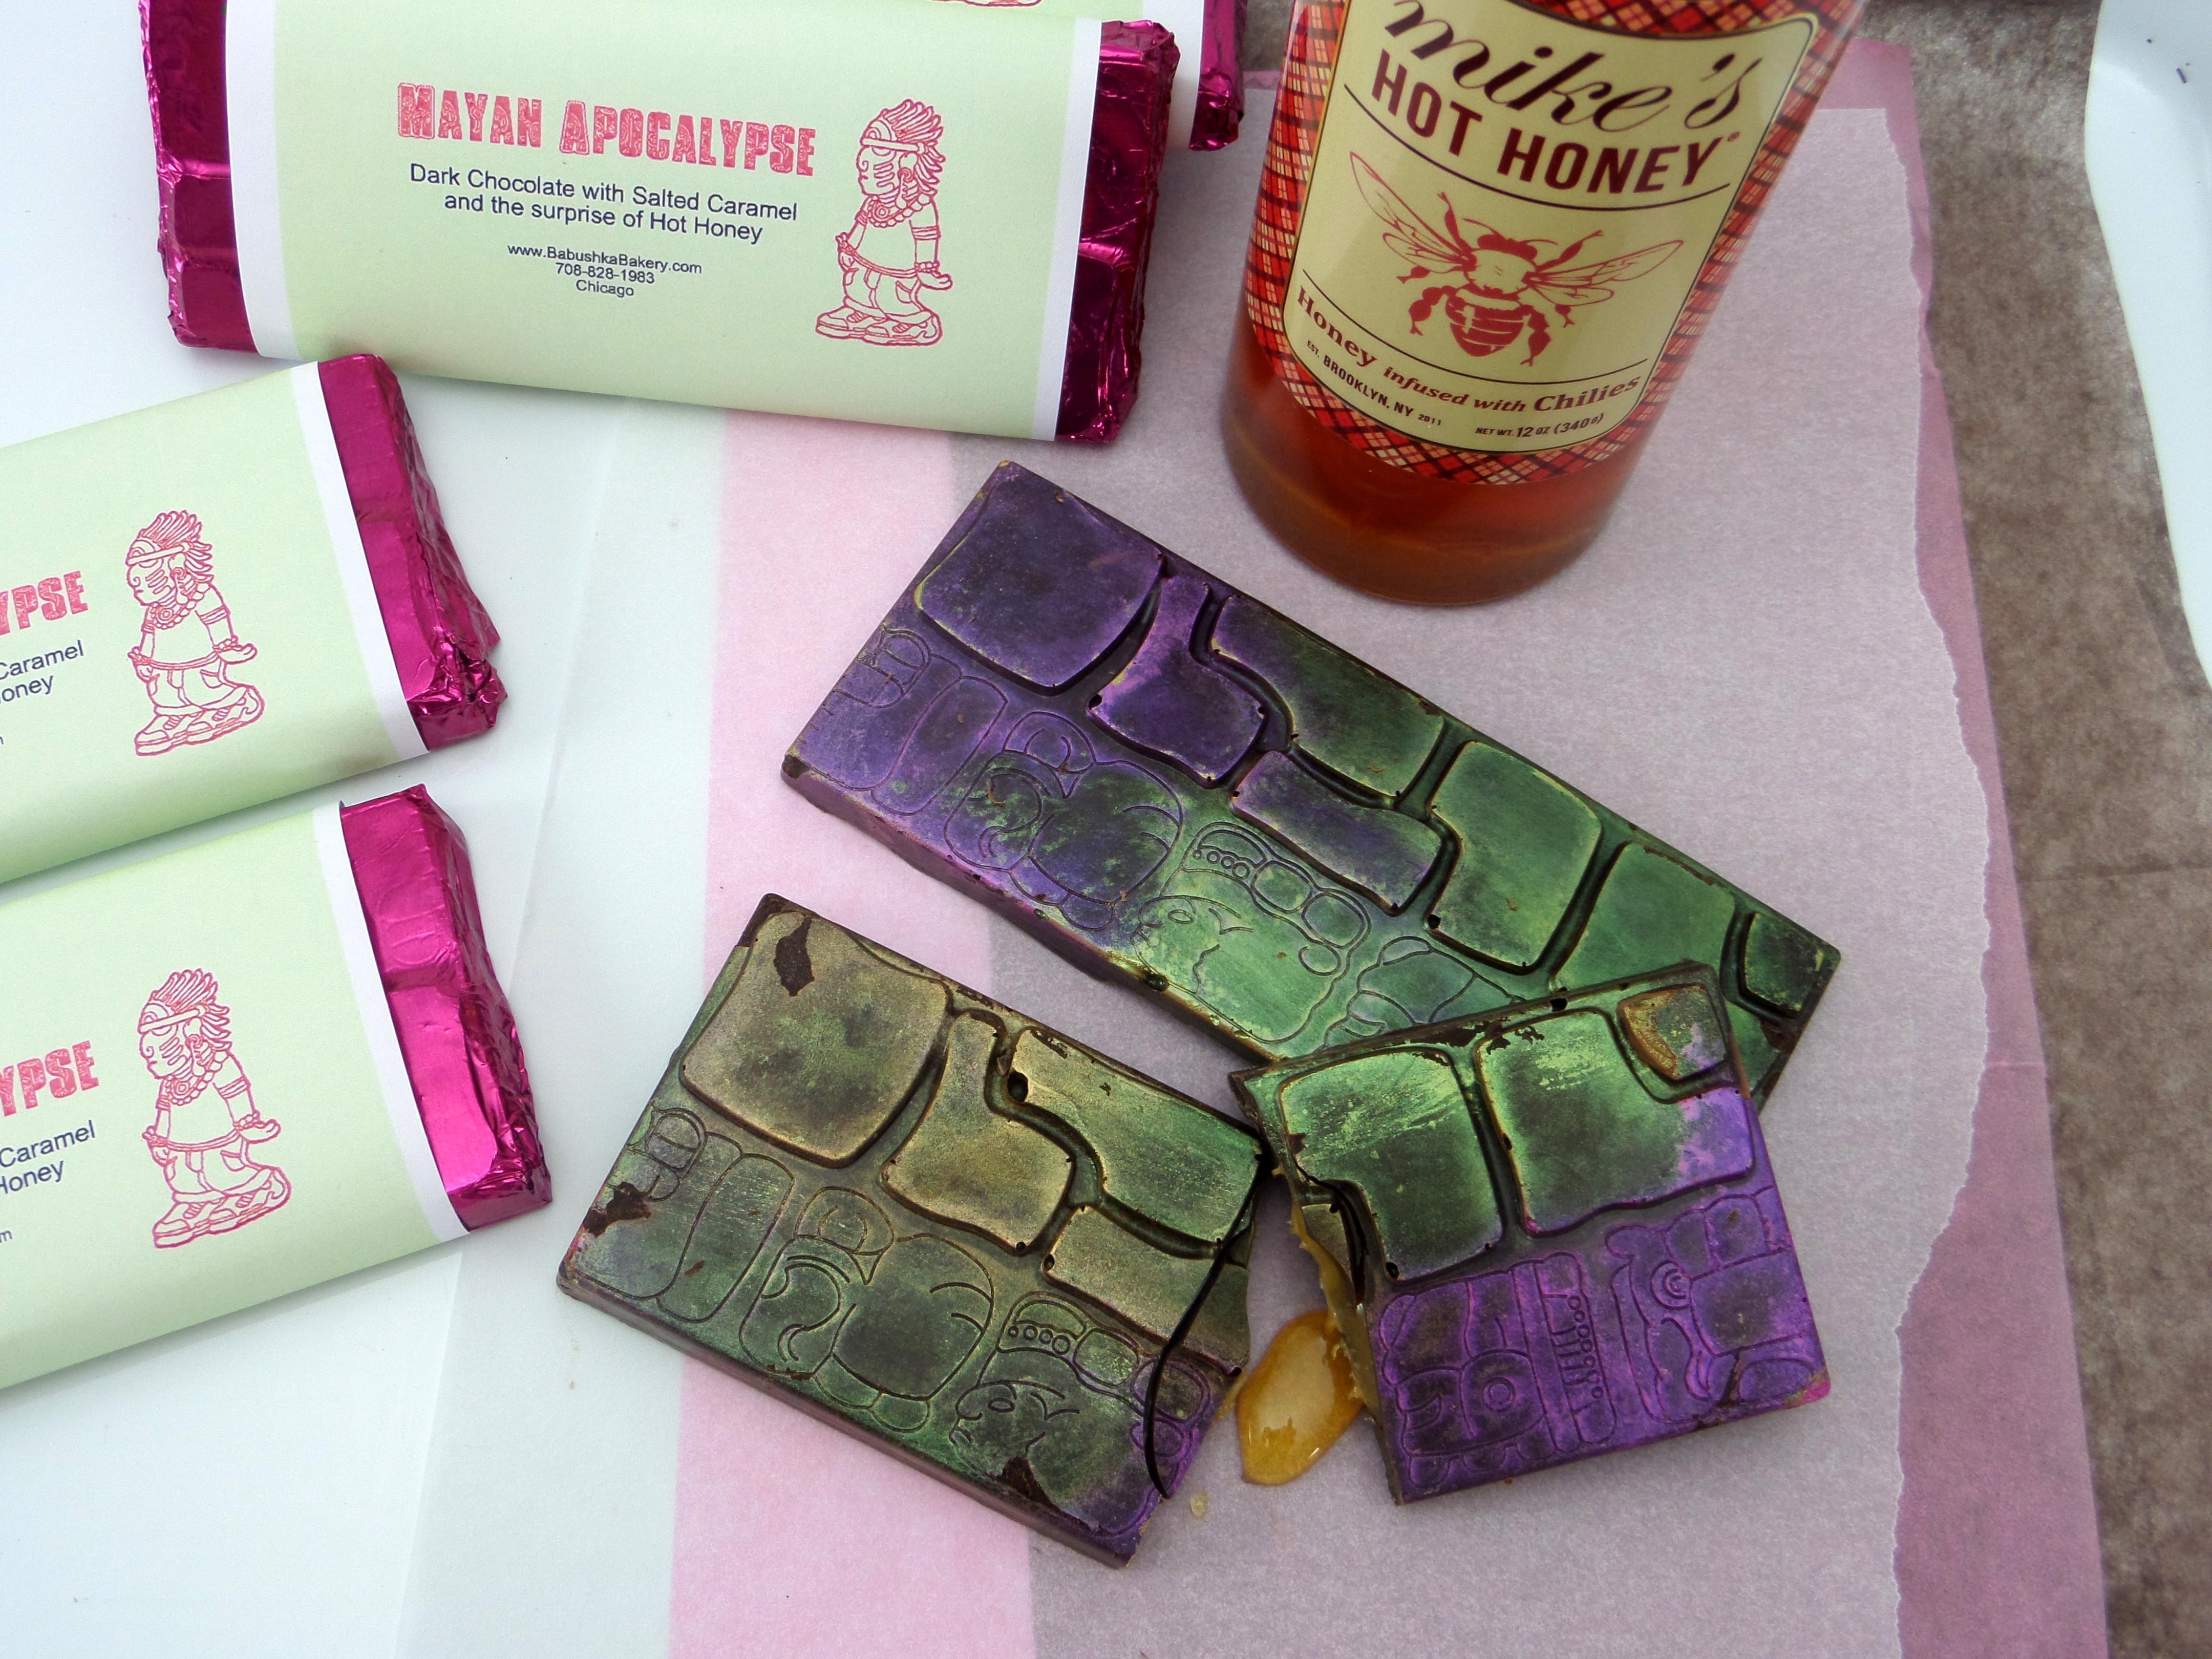 hot honey chocolate mayan bar.jpg